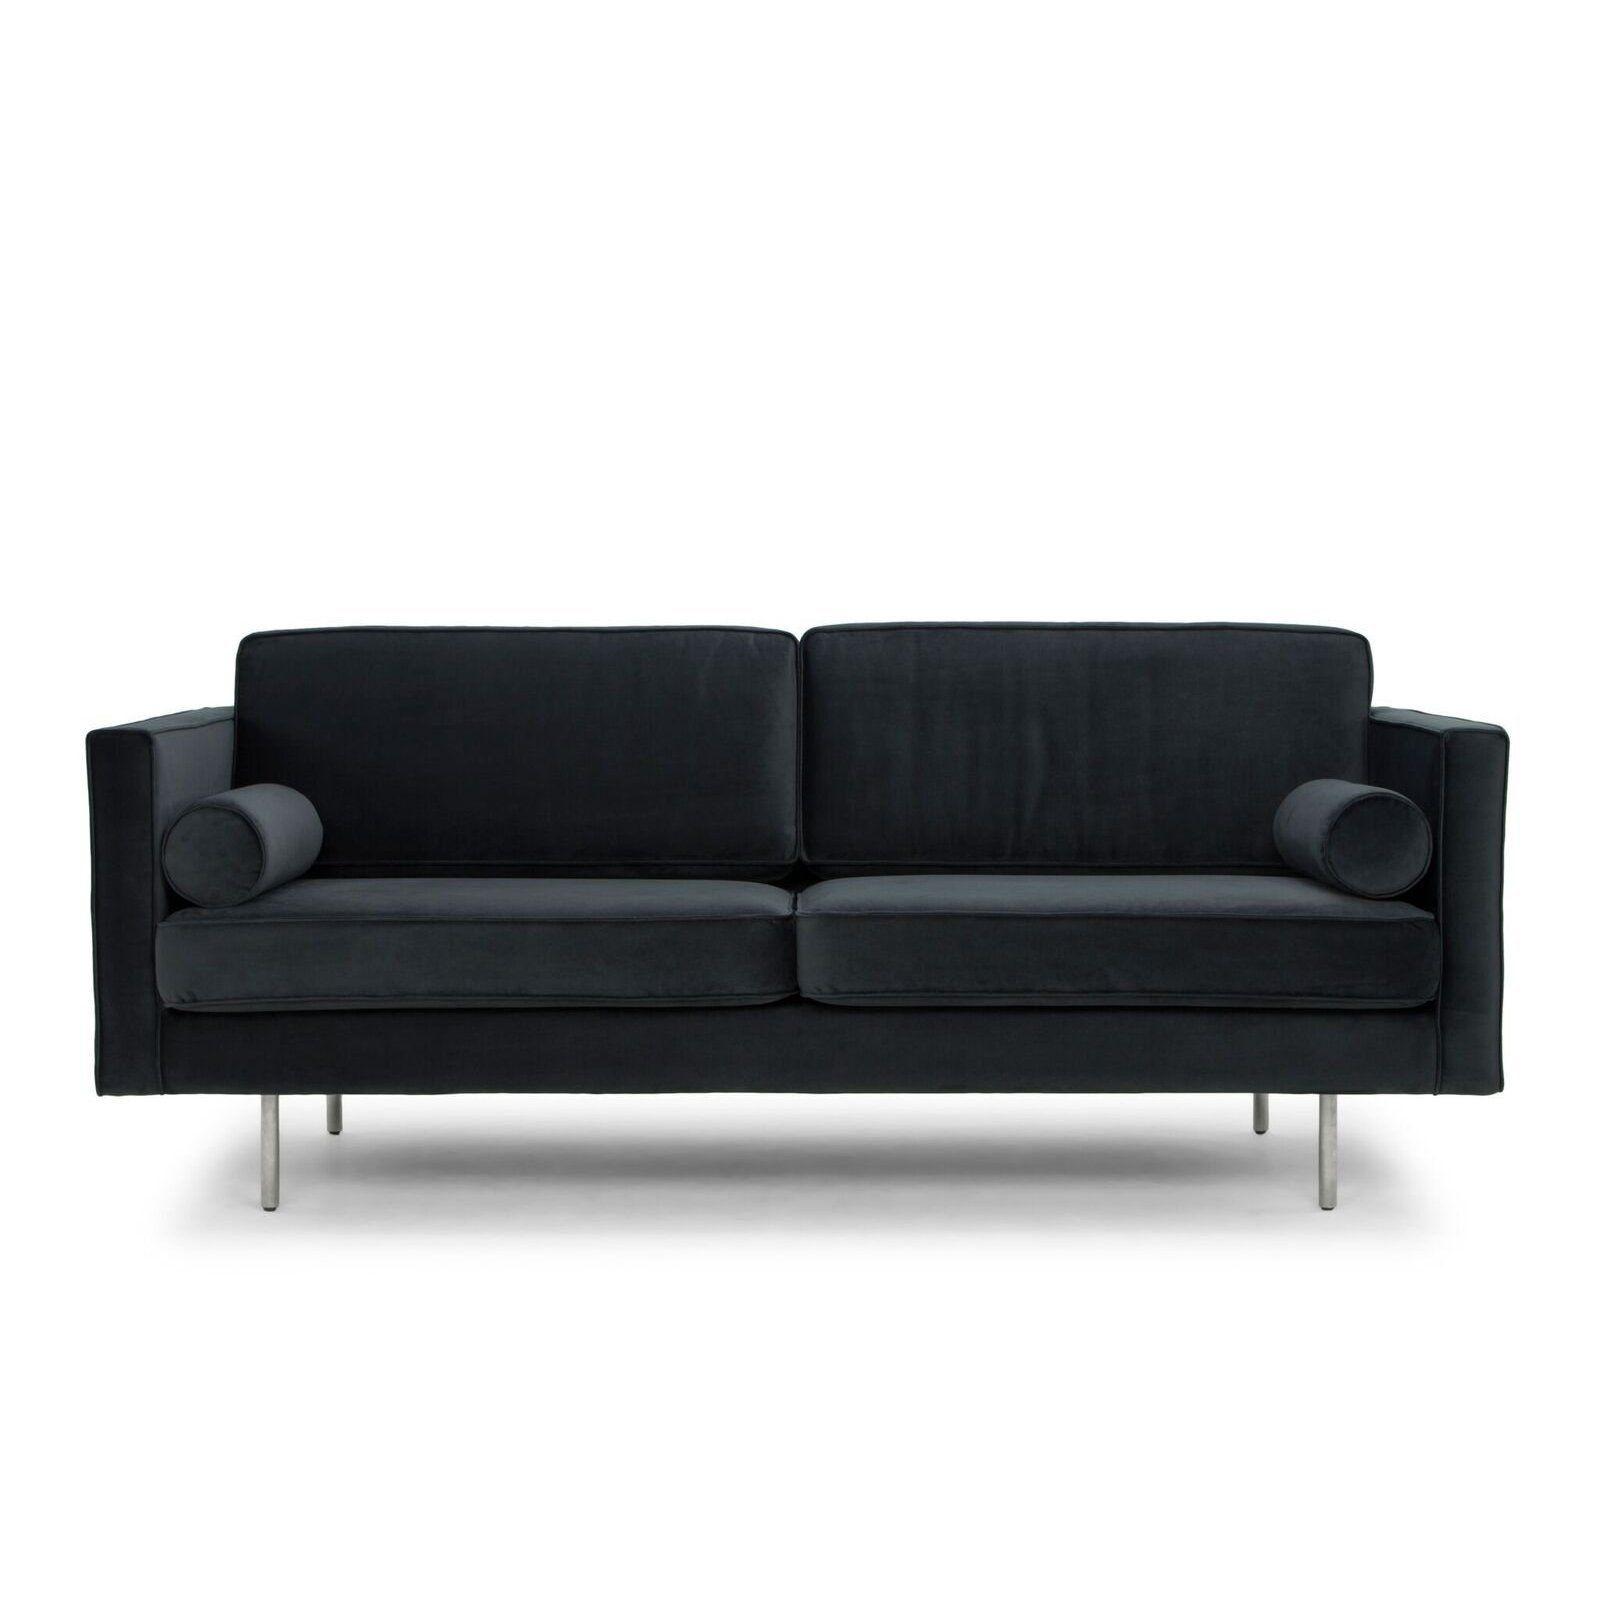 Cyrus Triple Seat Sofa Contemporary Sofa Sofa Modern Sofa